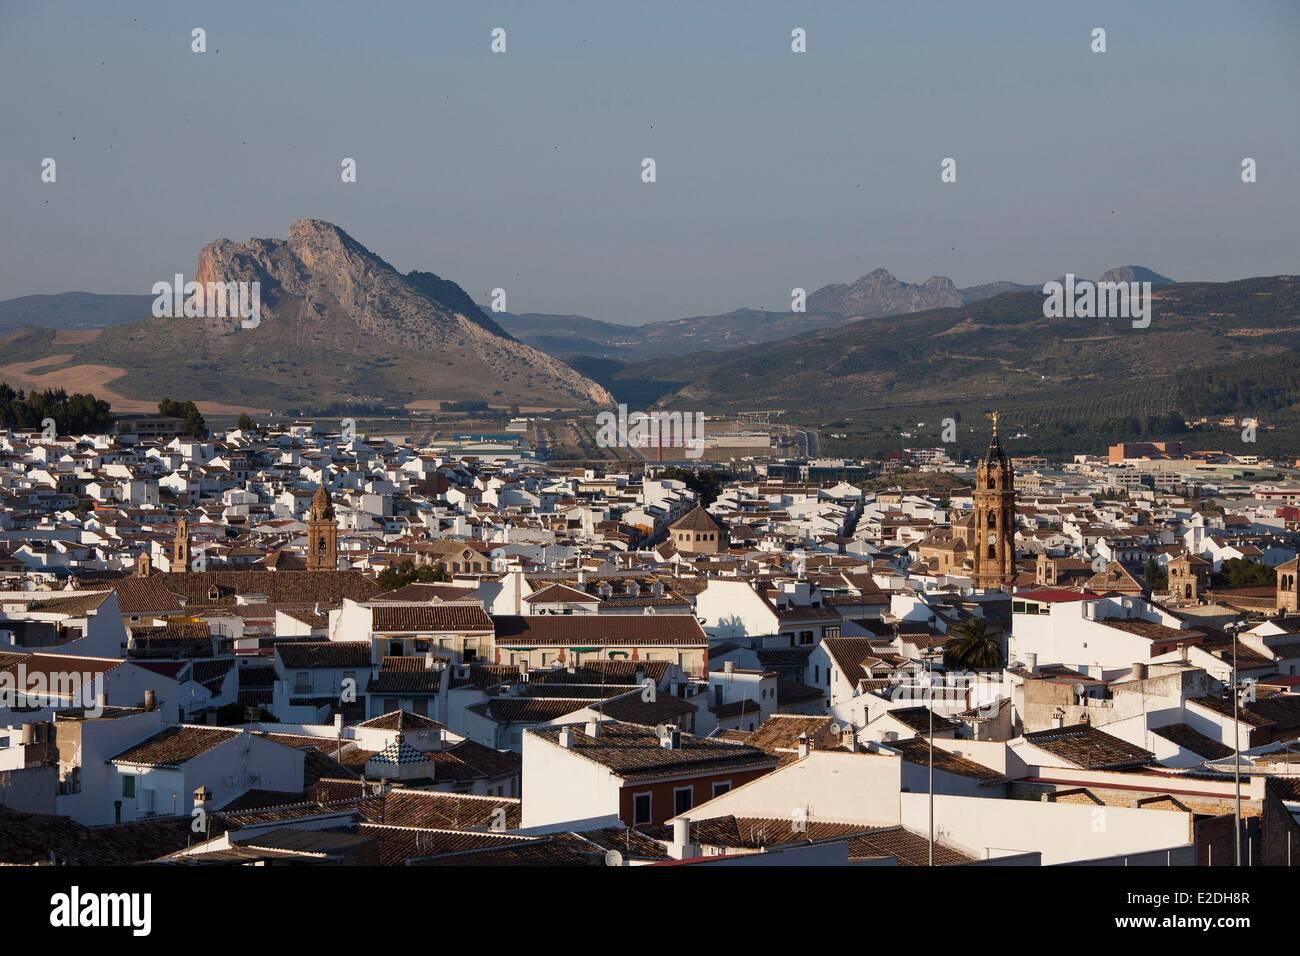 Spain, Andalusia, Antequera, white village, Penon de los Enamorados (Mount of lovers) - Stock Image